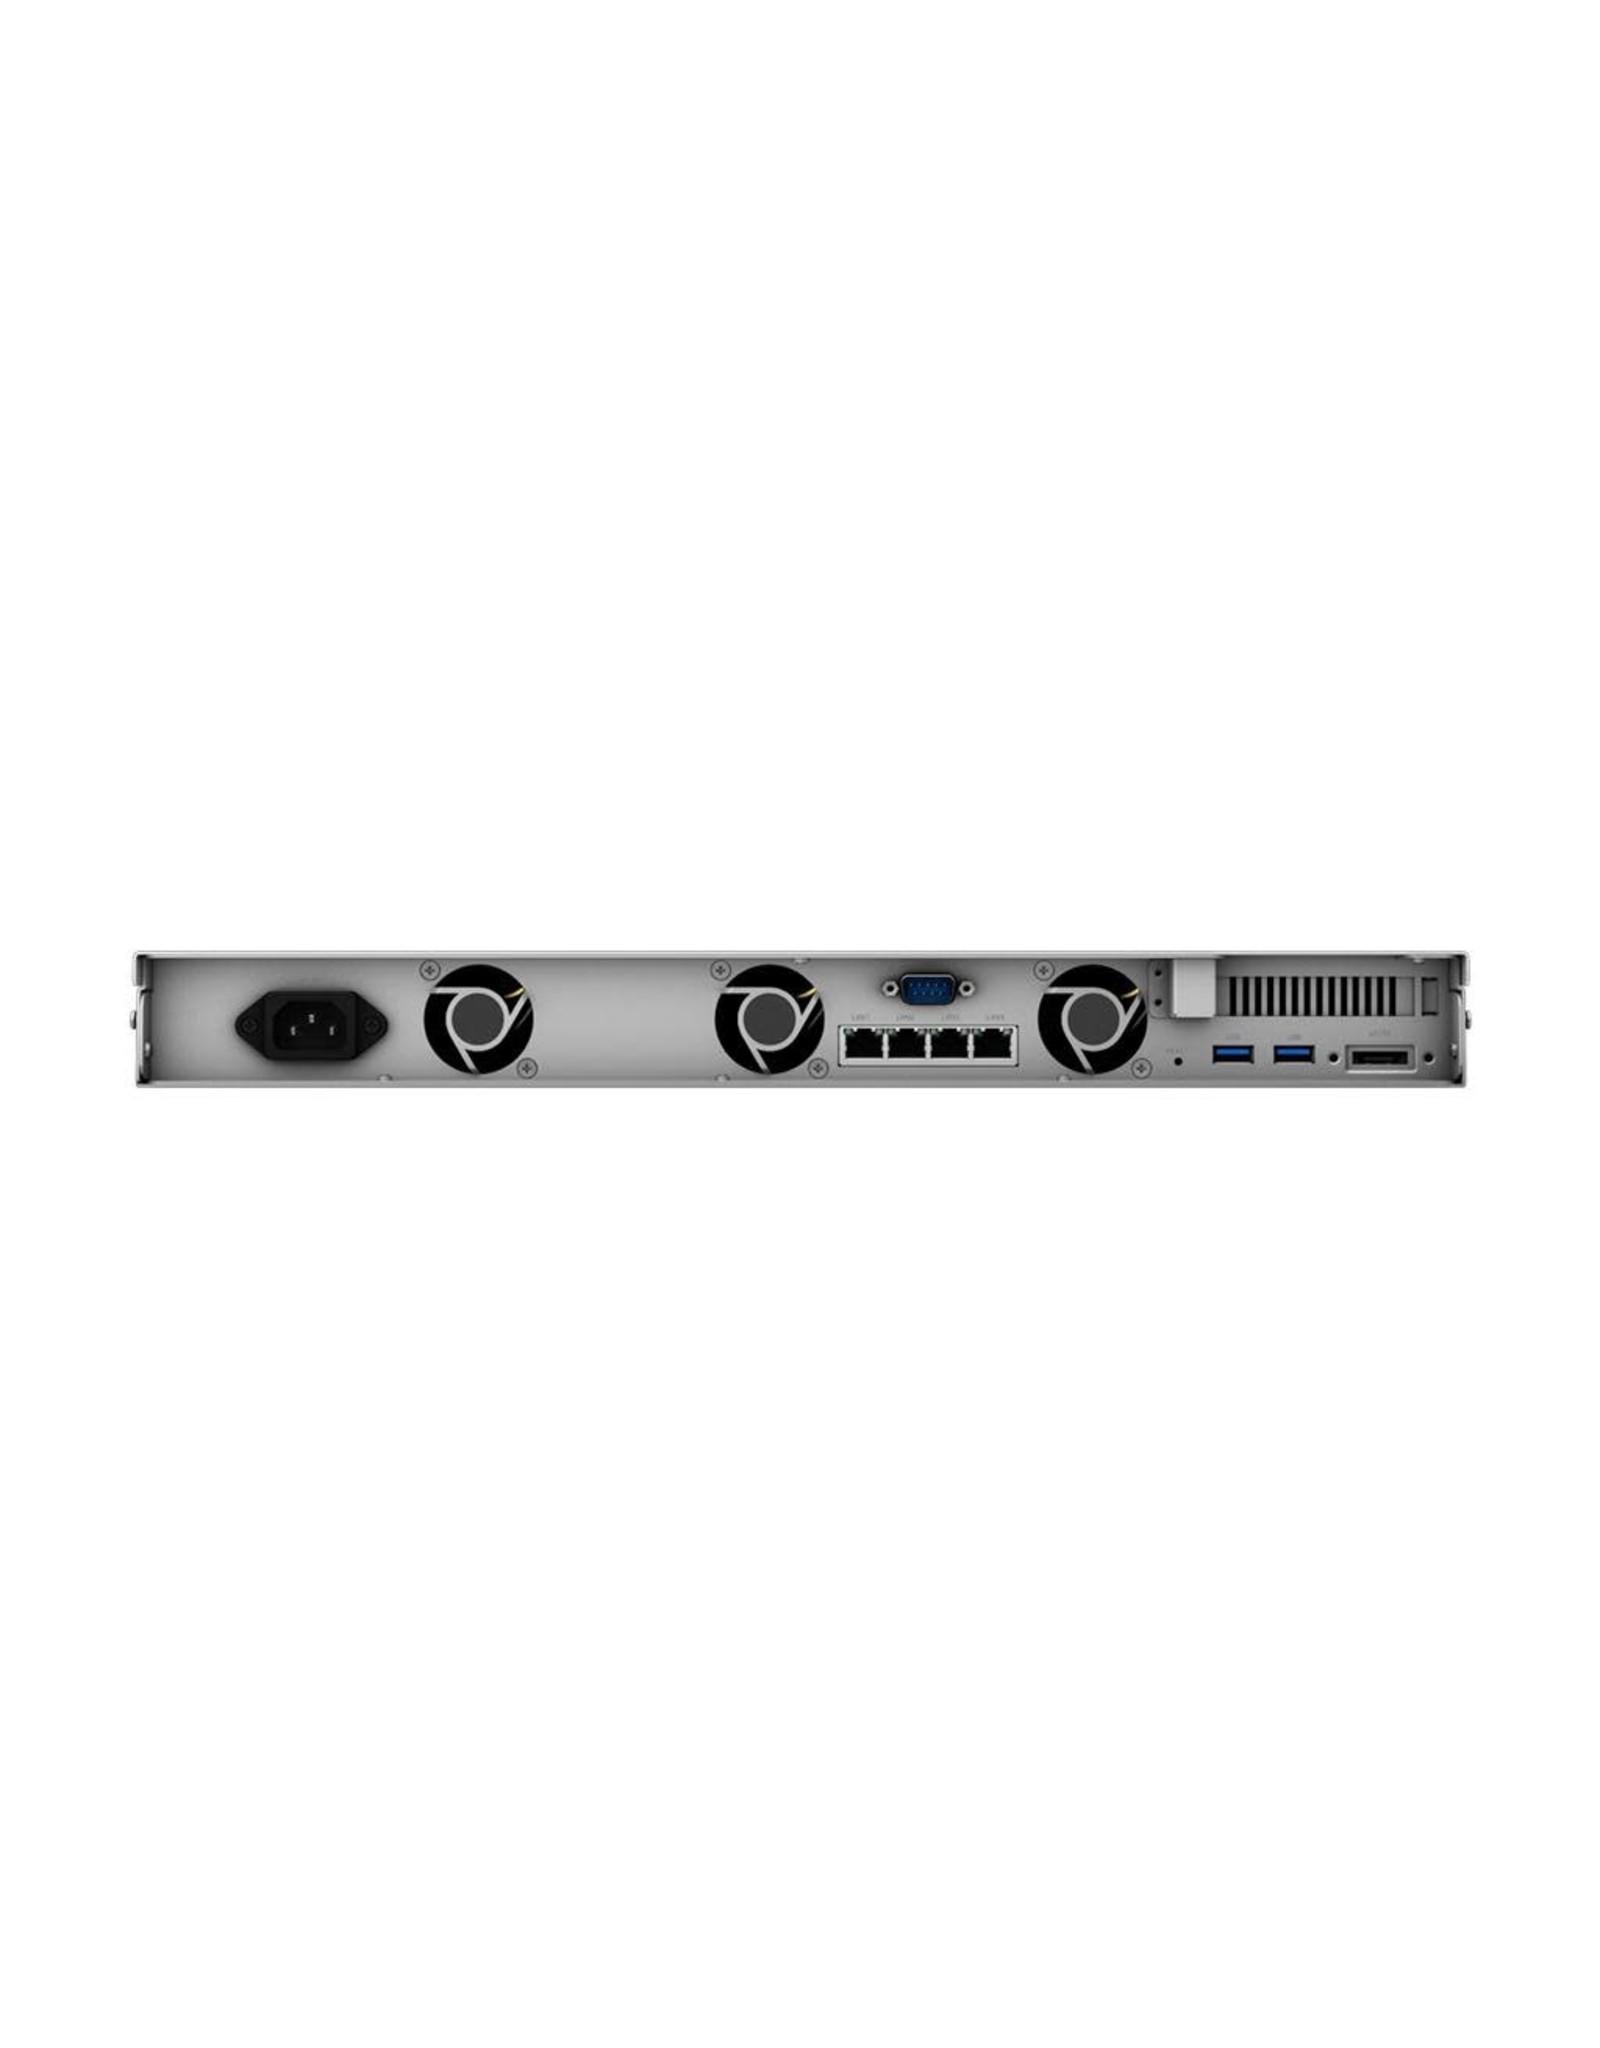 Synology Synology RS818+ 32TB 4-Bay 1RU High Performance 2.4GHz Quadcore NAS Server (4x8TB Value Enterprise HDD 5YR)